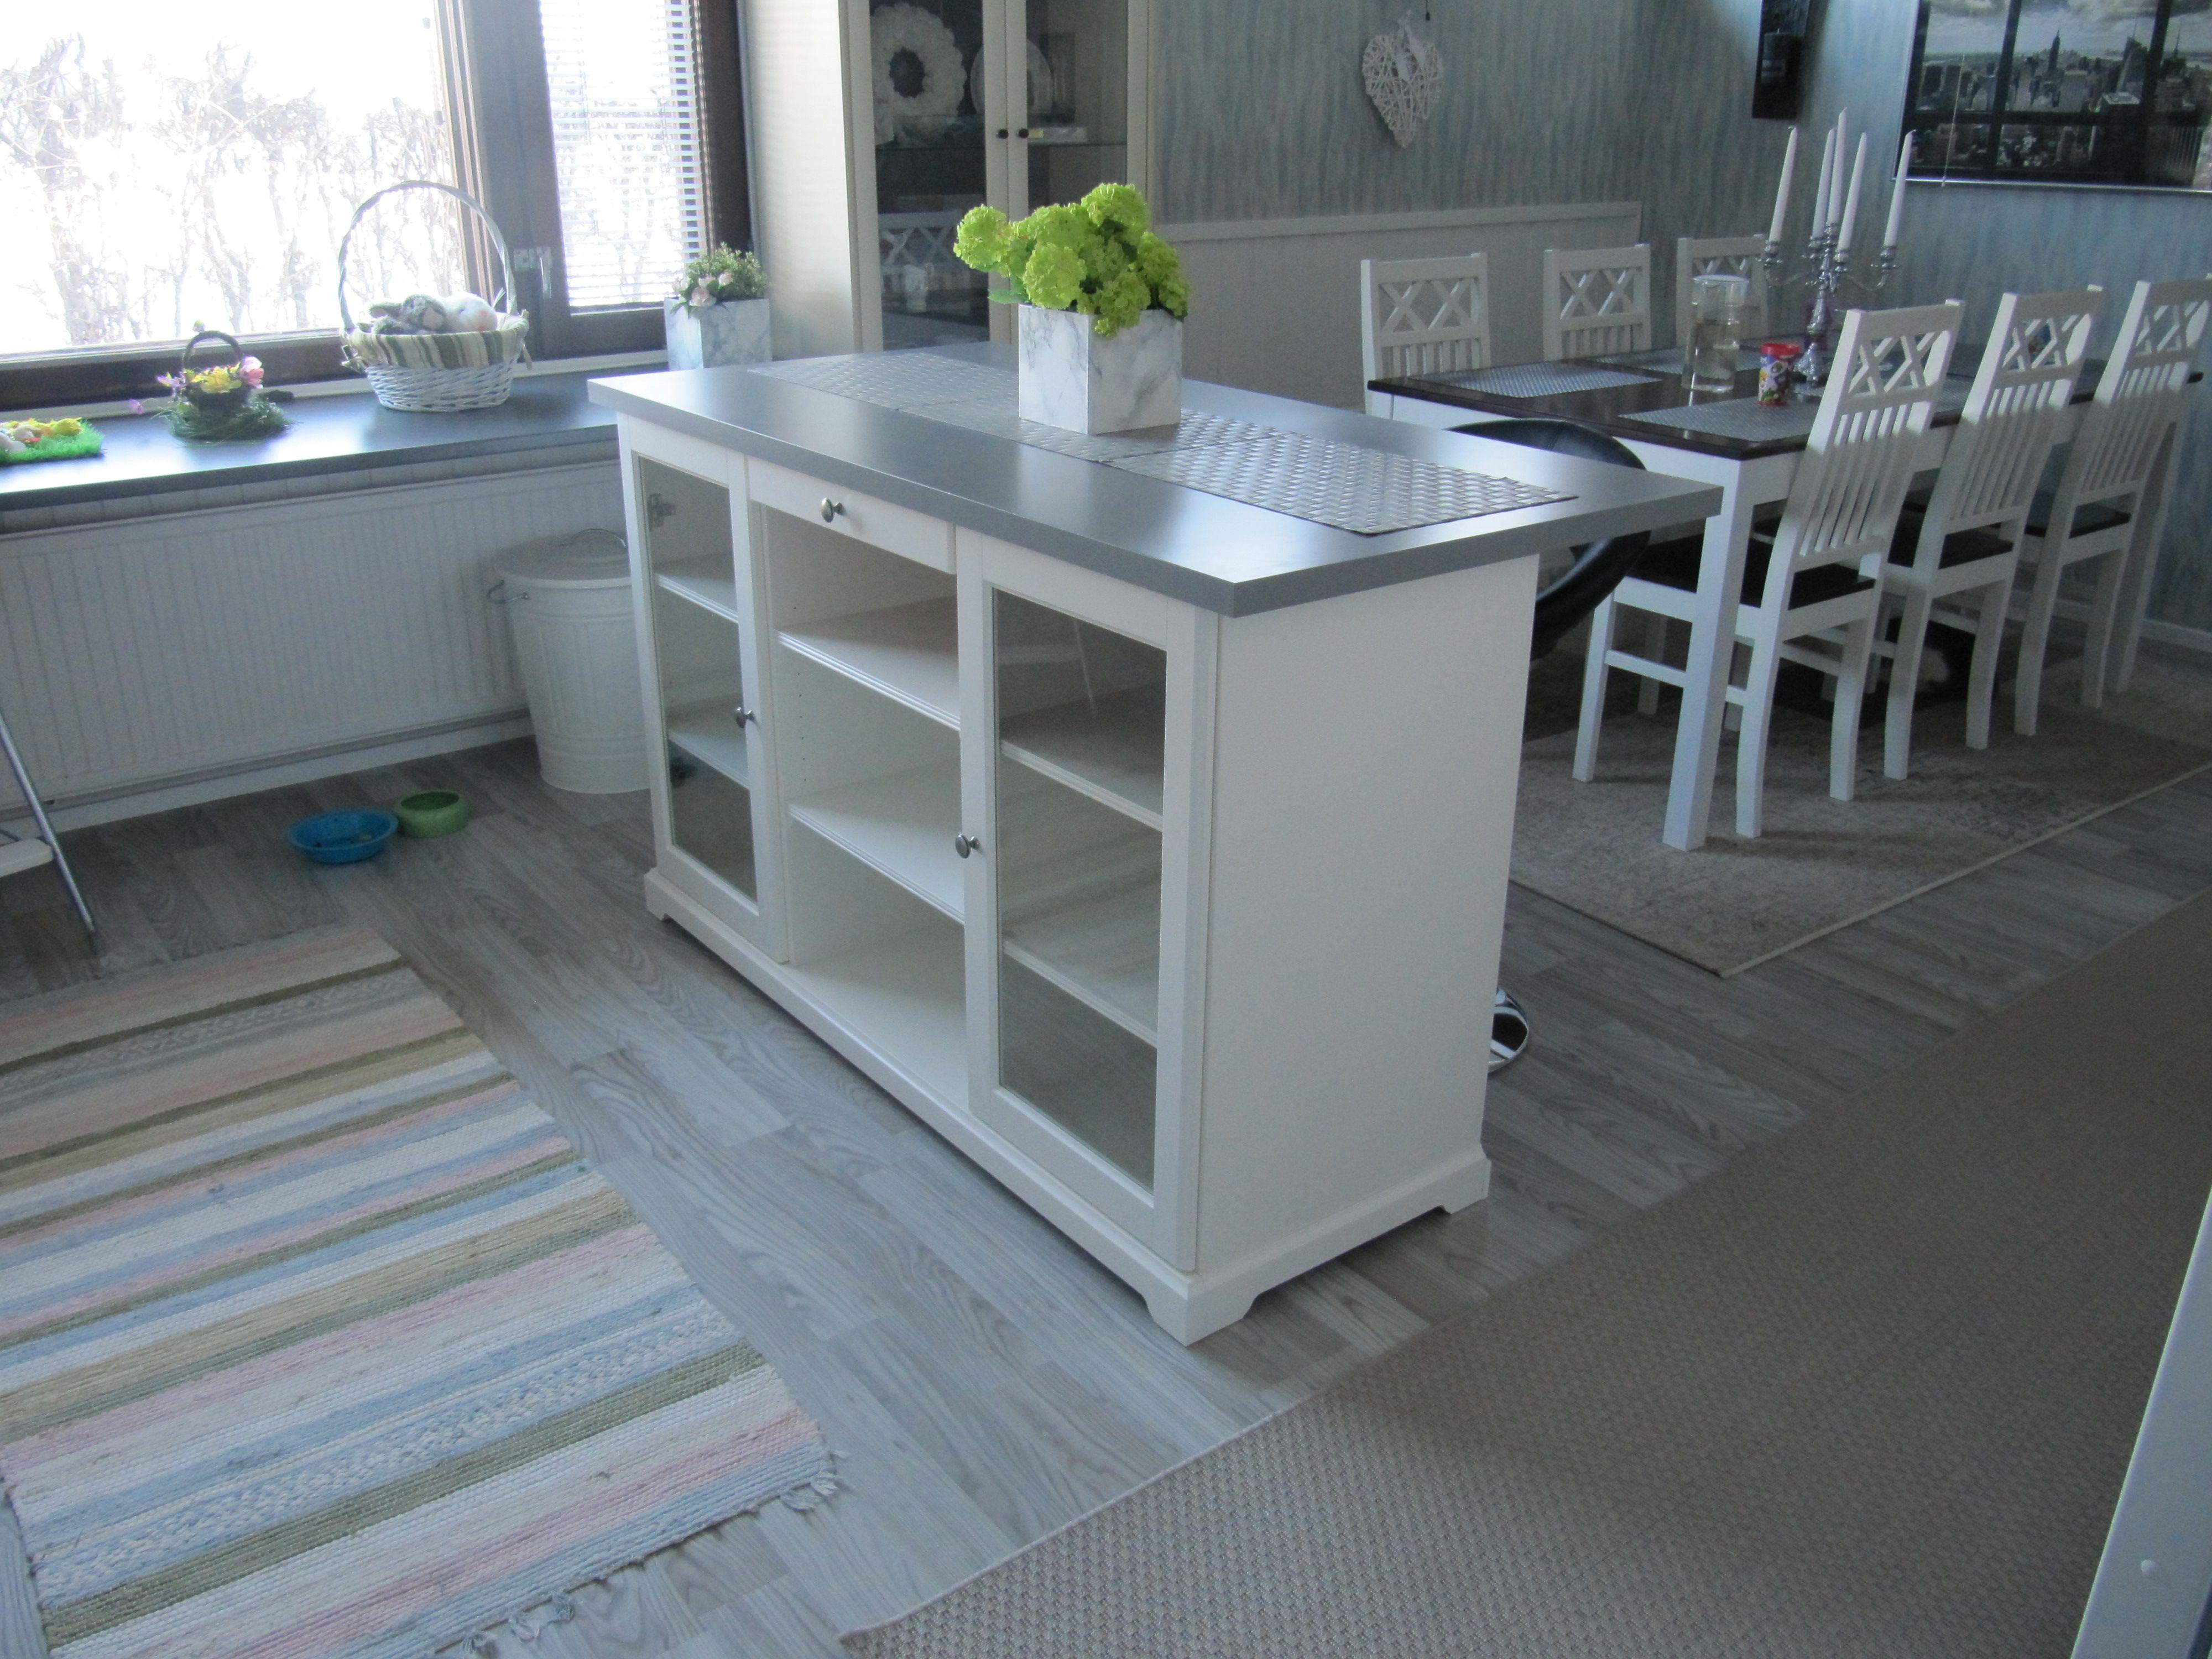 Credenza Liatorp Ikea : Kitchen after renovation. ikea hack liatorp senkki linnmom